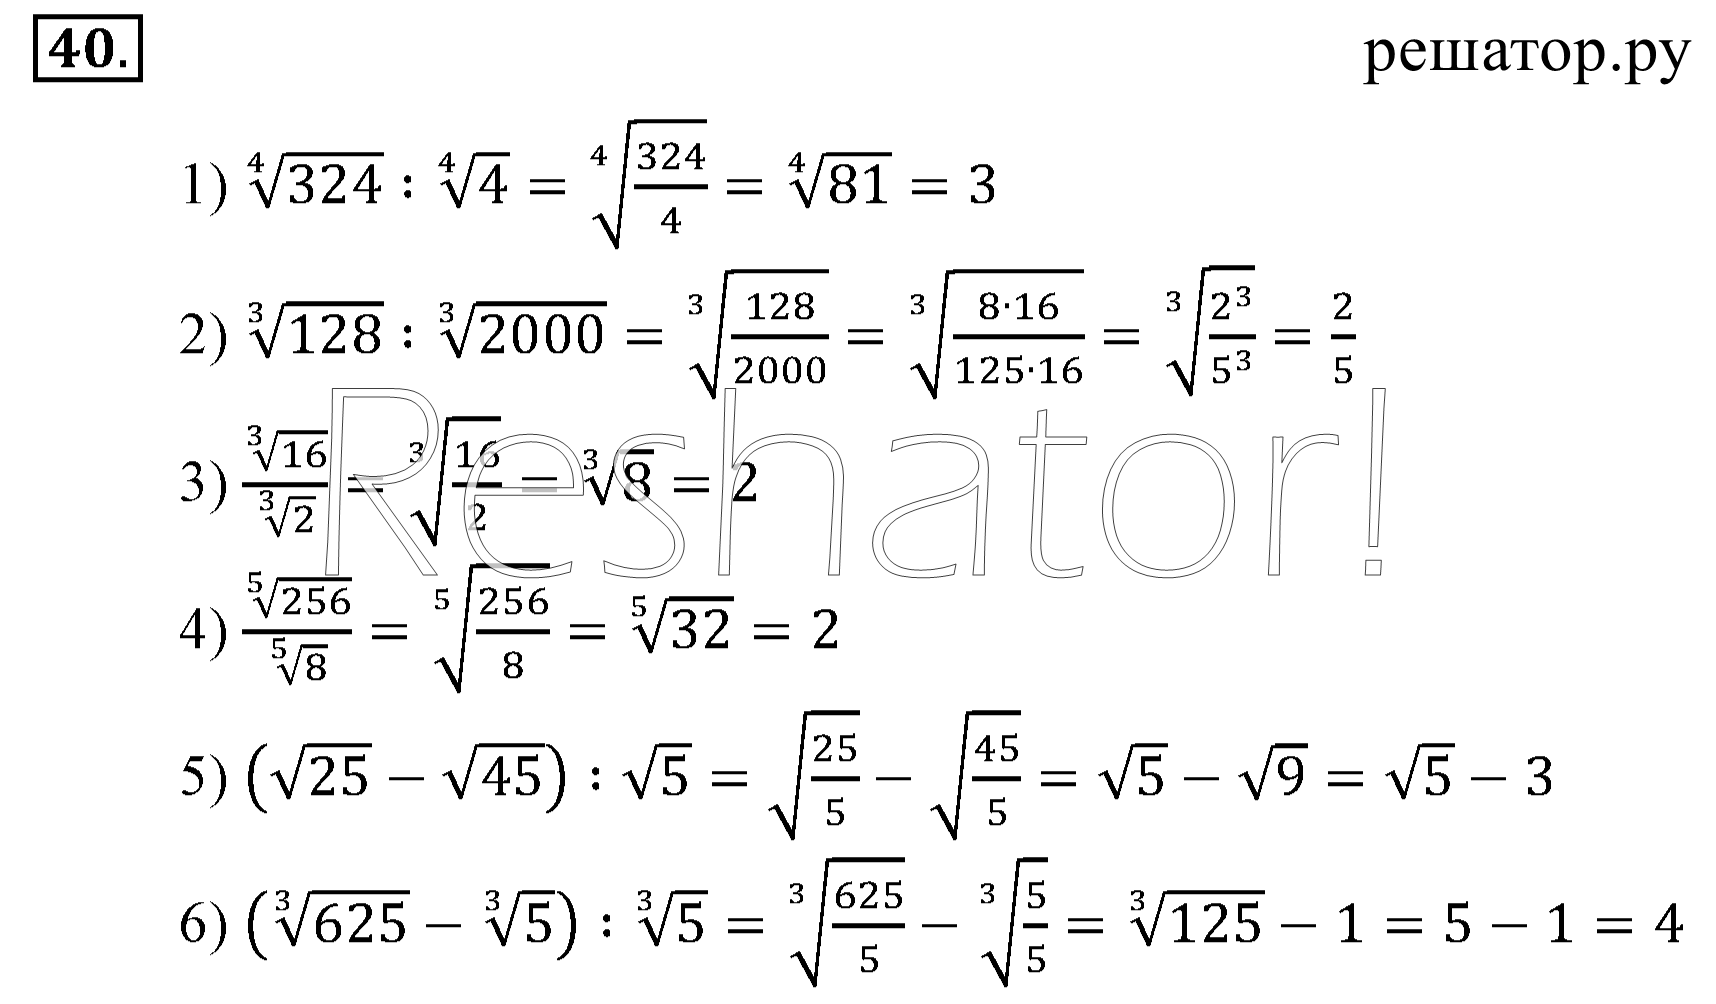 Алимов алгебра 10 11 класс гдз онлайн гдз от цезаря.